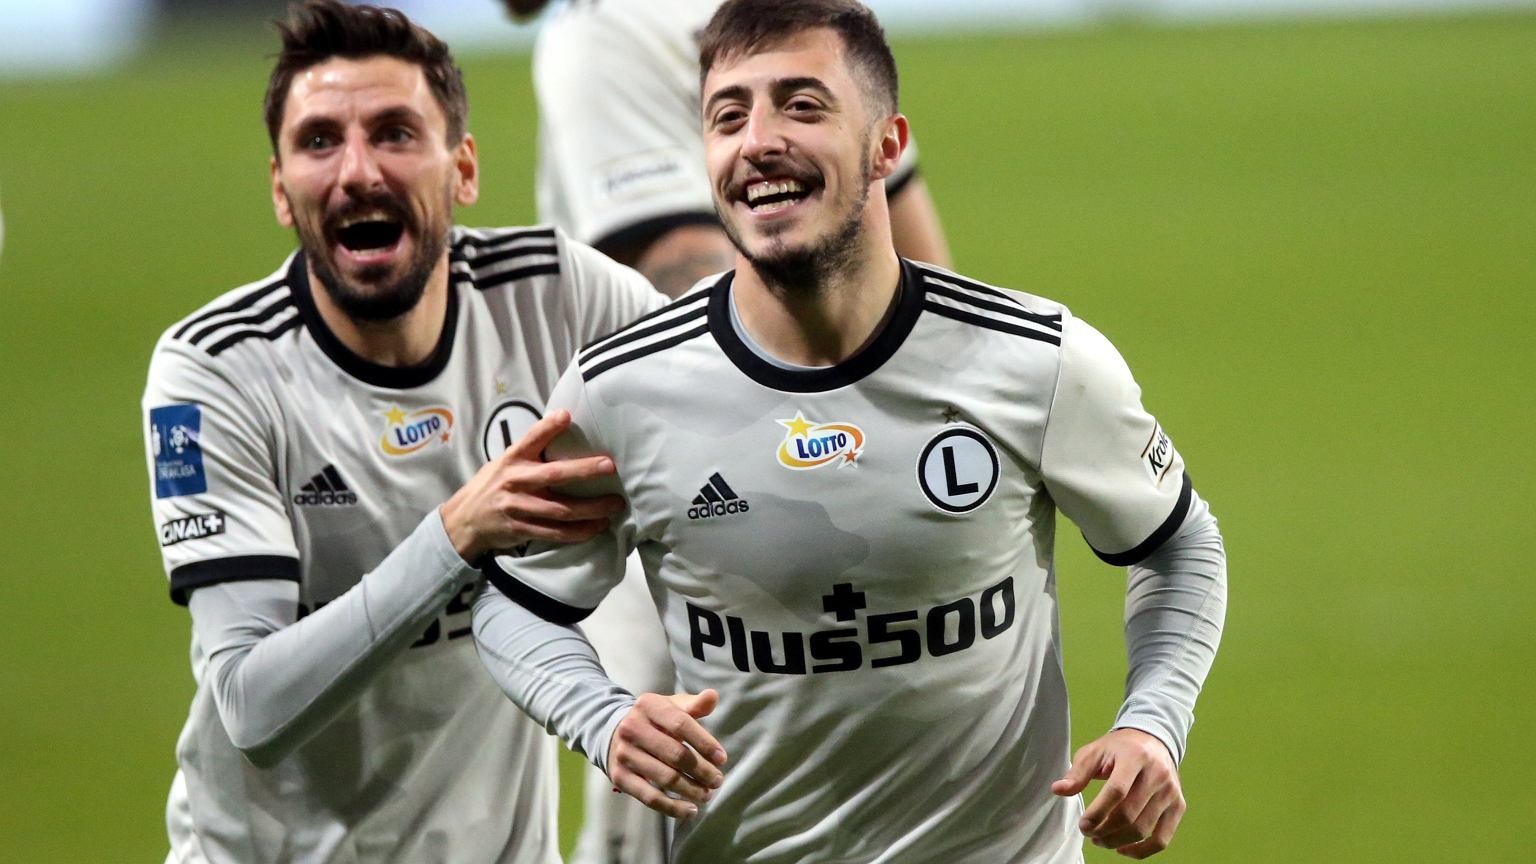 Legia Warszawa's goals in the match Warta